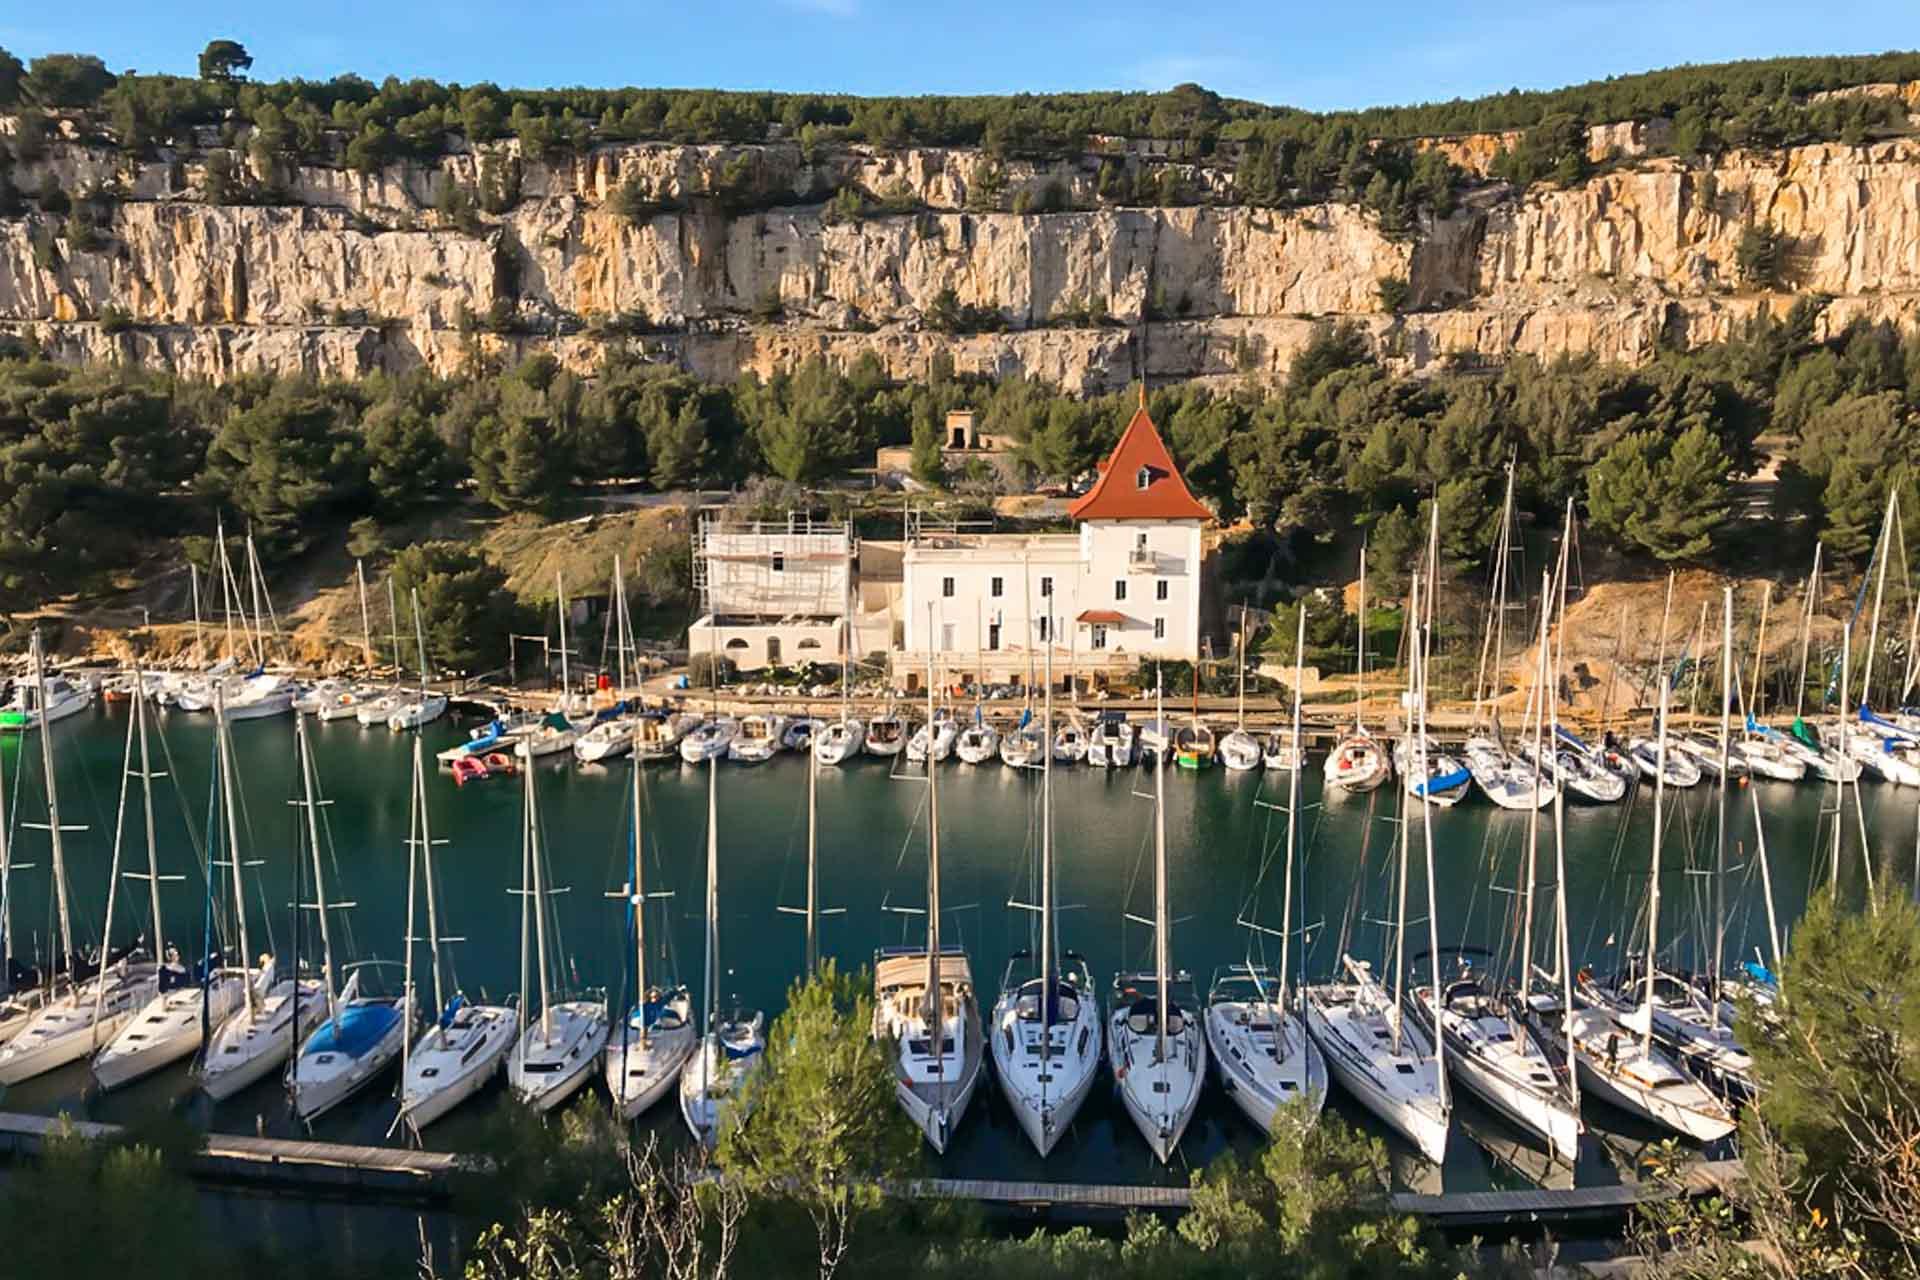 Calanque de Port-Miou - Marseille